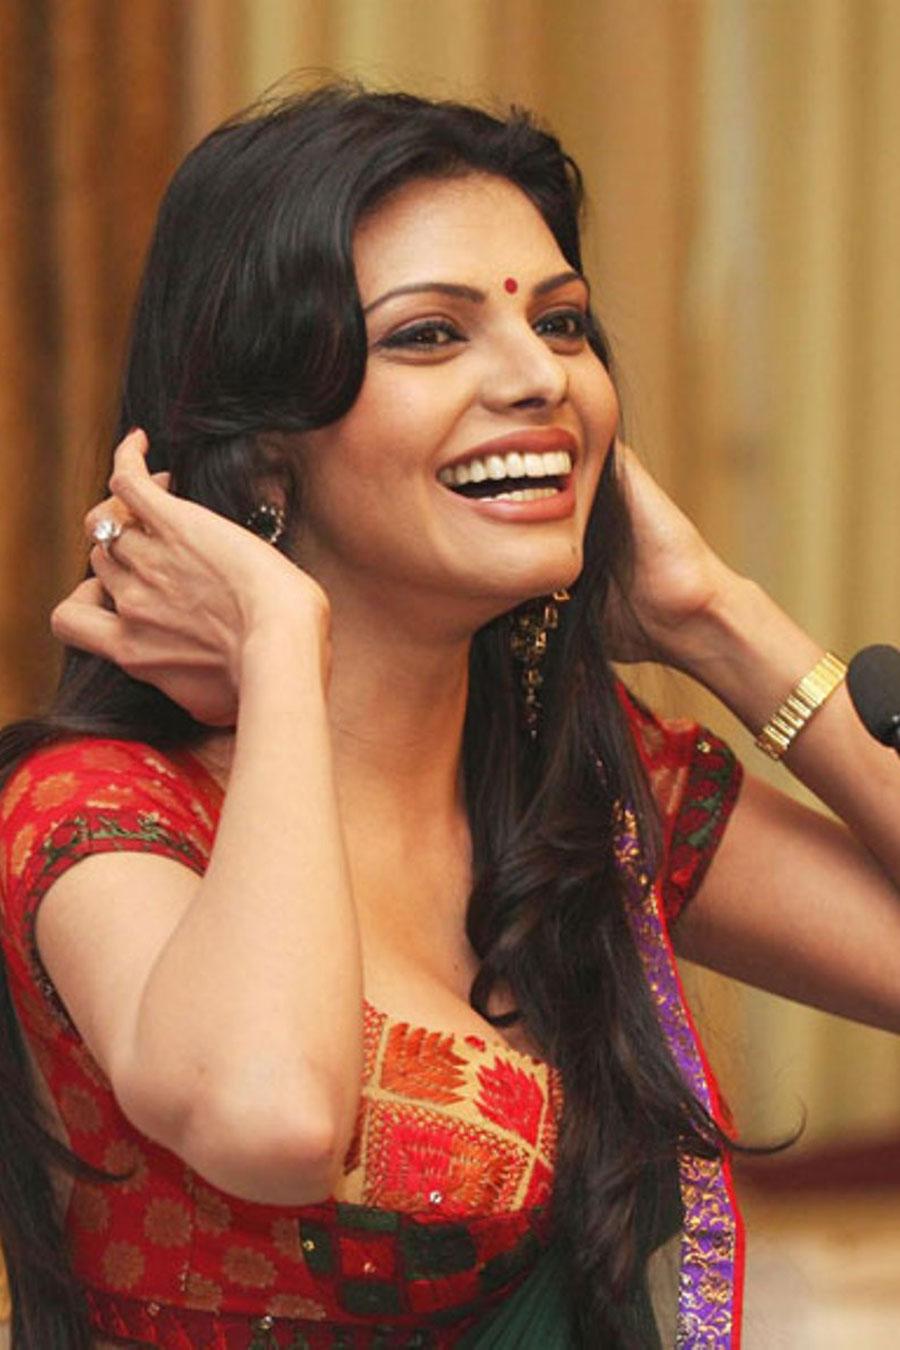 Popular Girl Wallpapers Sherlyn Chopra Hot Photos In Saree